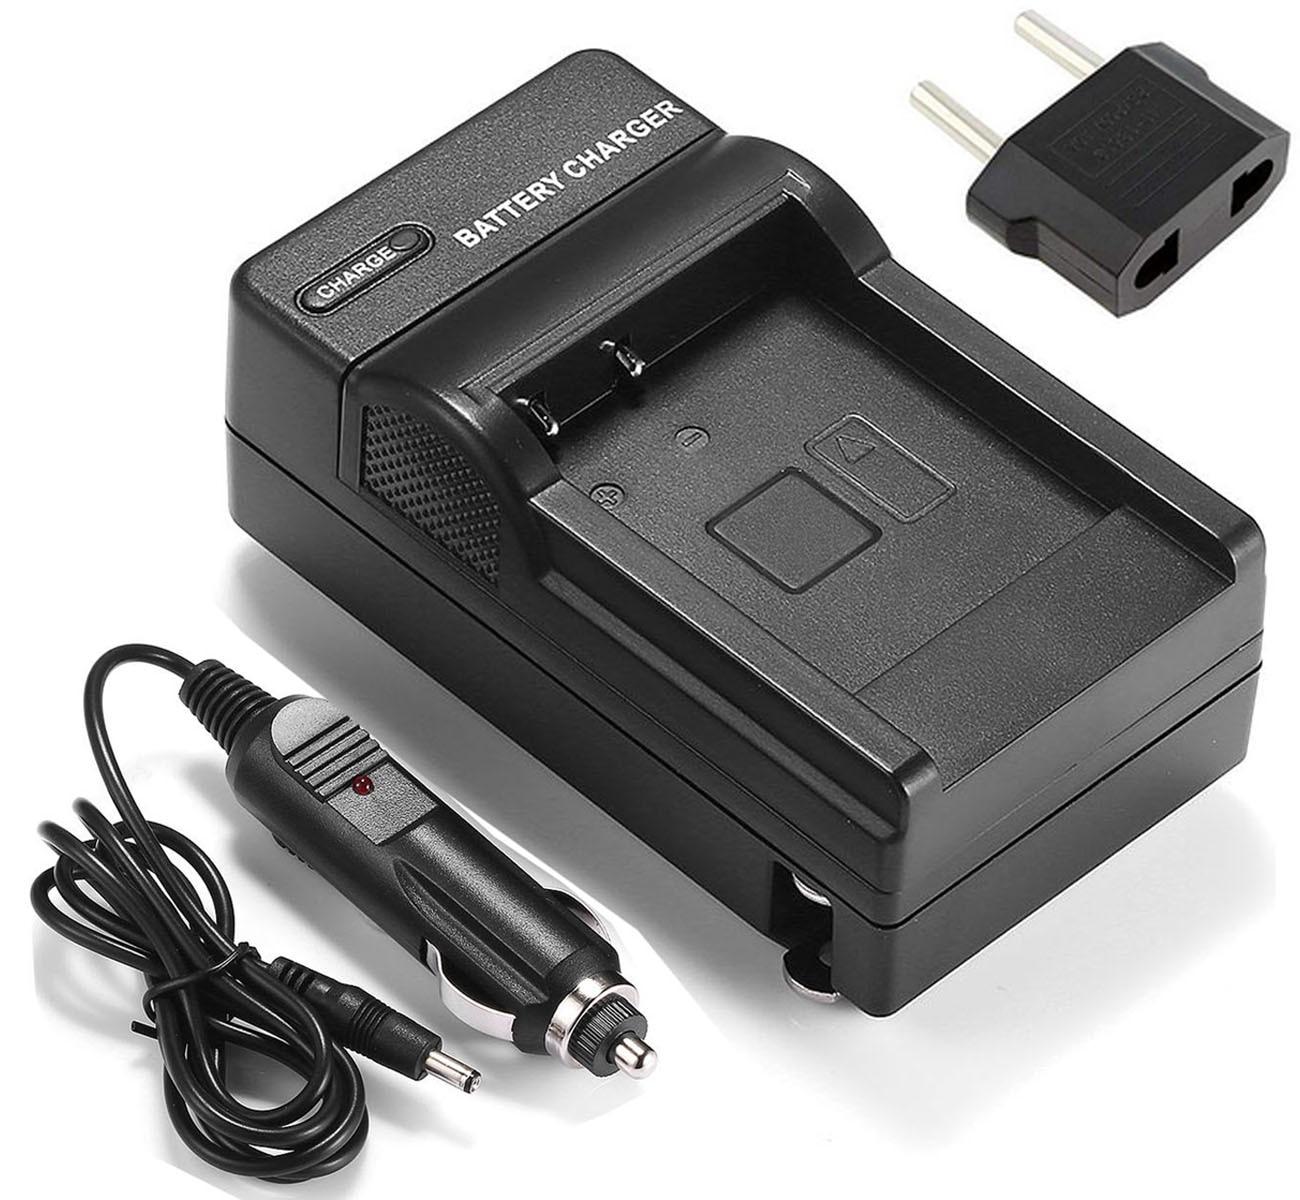 Cargador de batería para JVC GR-D240EK, D250EK, GR-D250U, GR-D270U, GR-D271U, GR-D275U, GR-D290U, GR-D295U, D290EK MiniDV videocámara